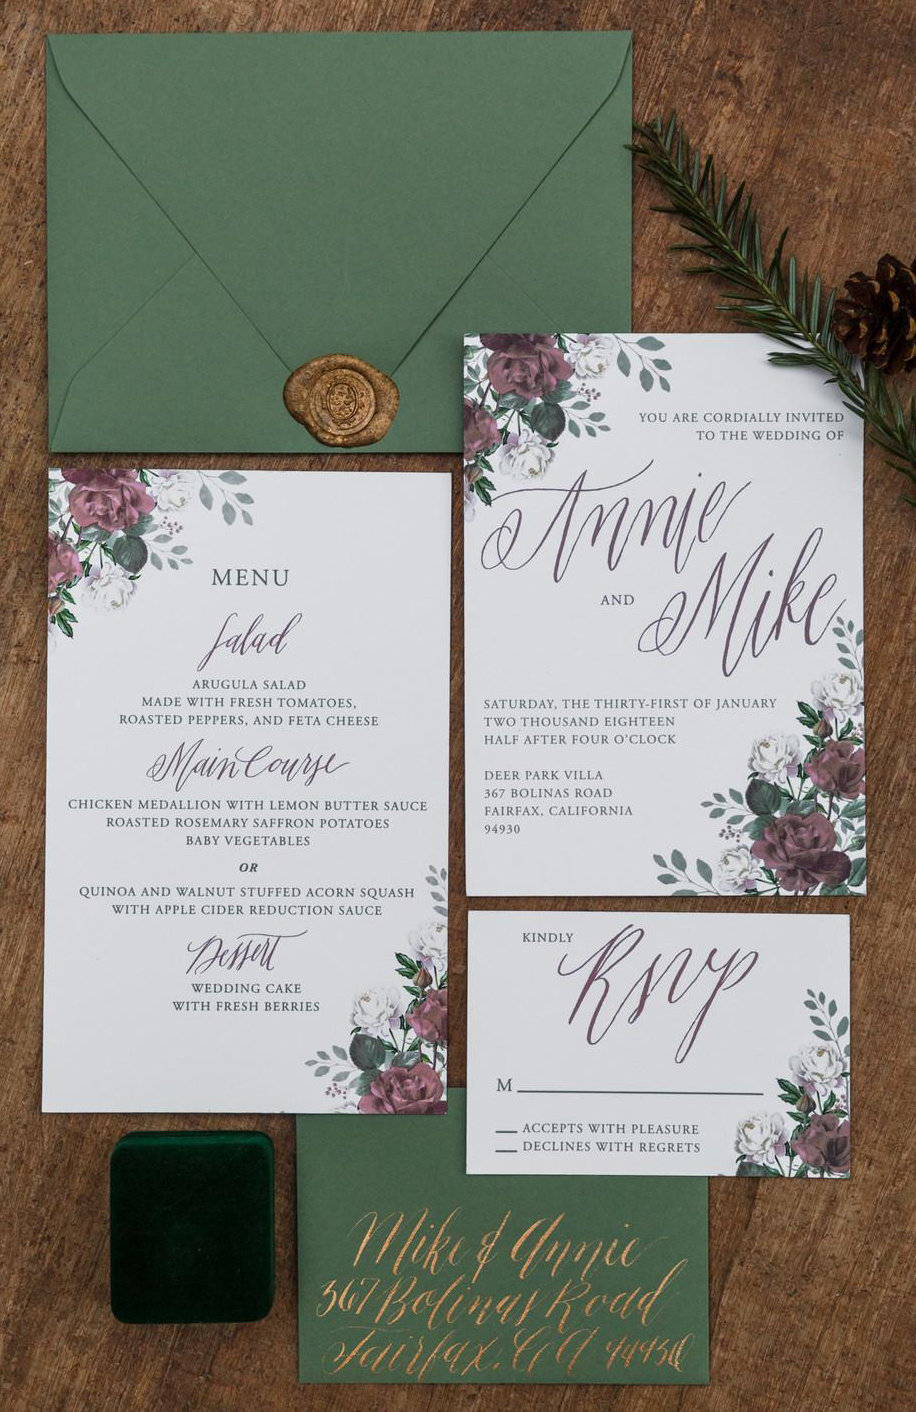 Wedding Invitation Suite w/matching Menu Design. Photo courtesy of  Lara Onac Photography .